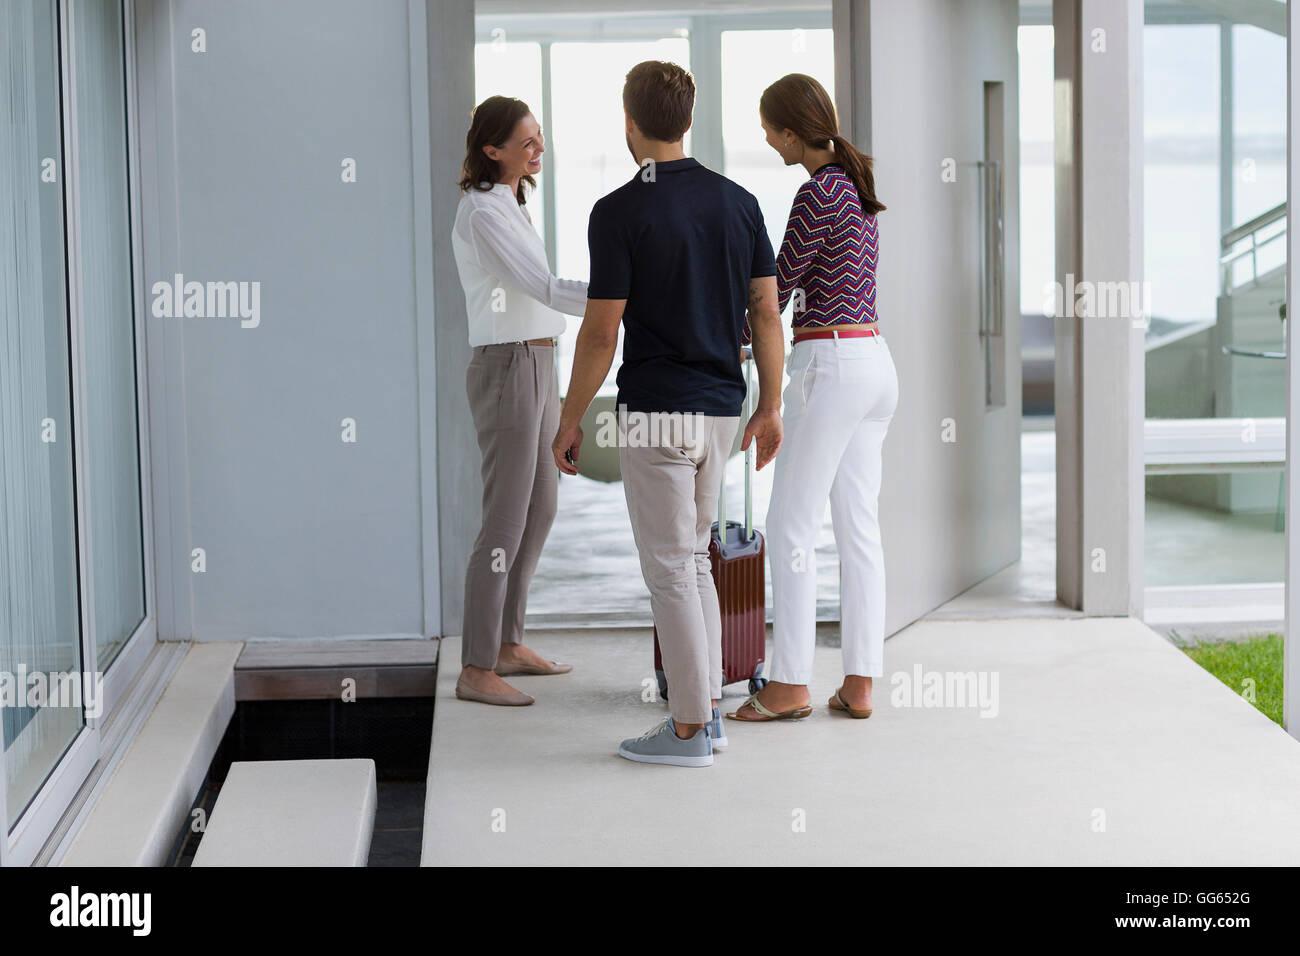 Woman welcoming her friends at doorway - Stock Image